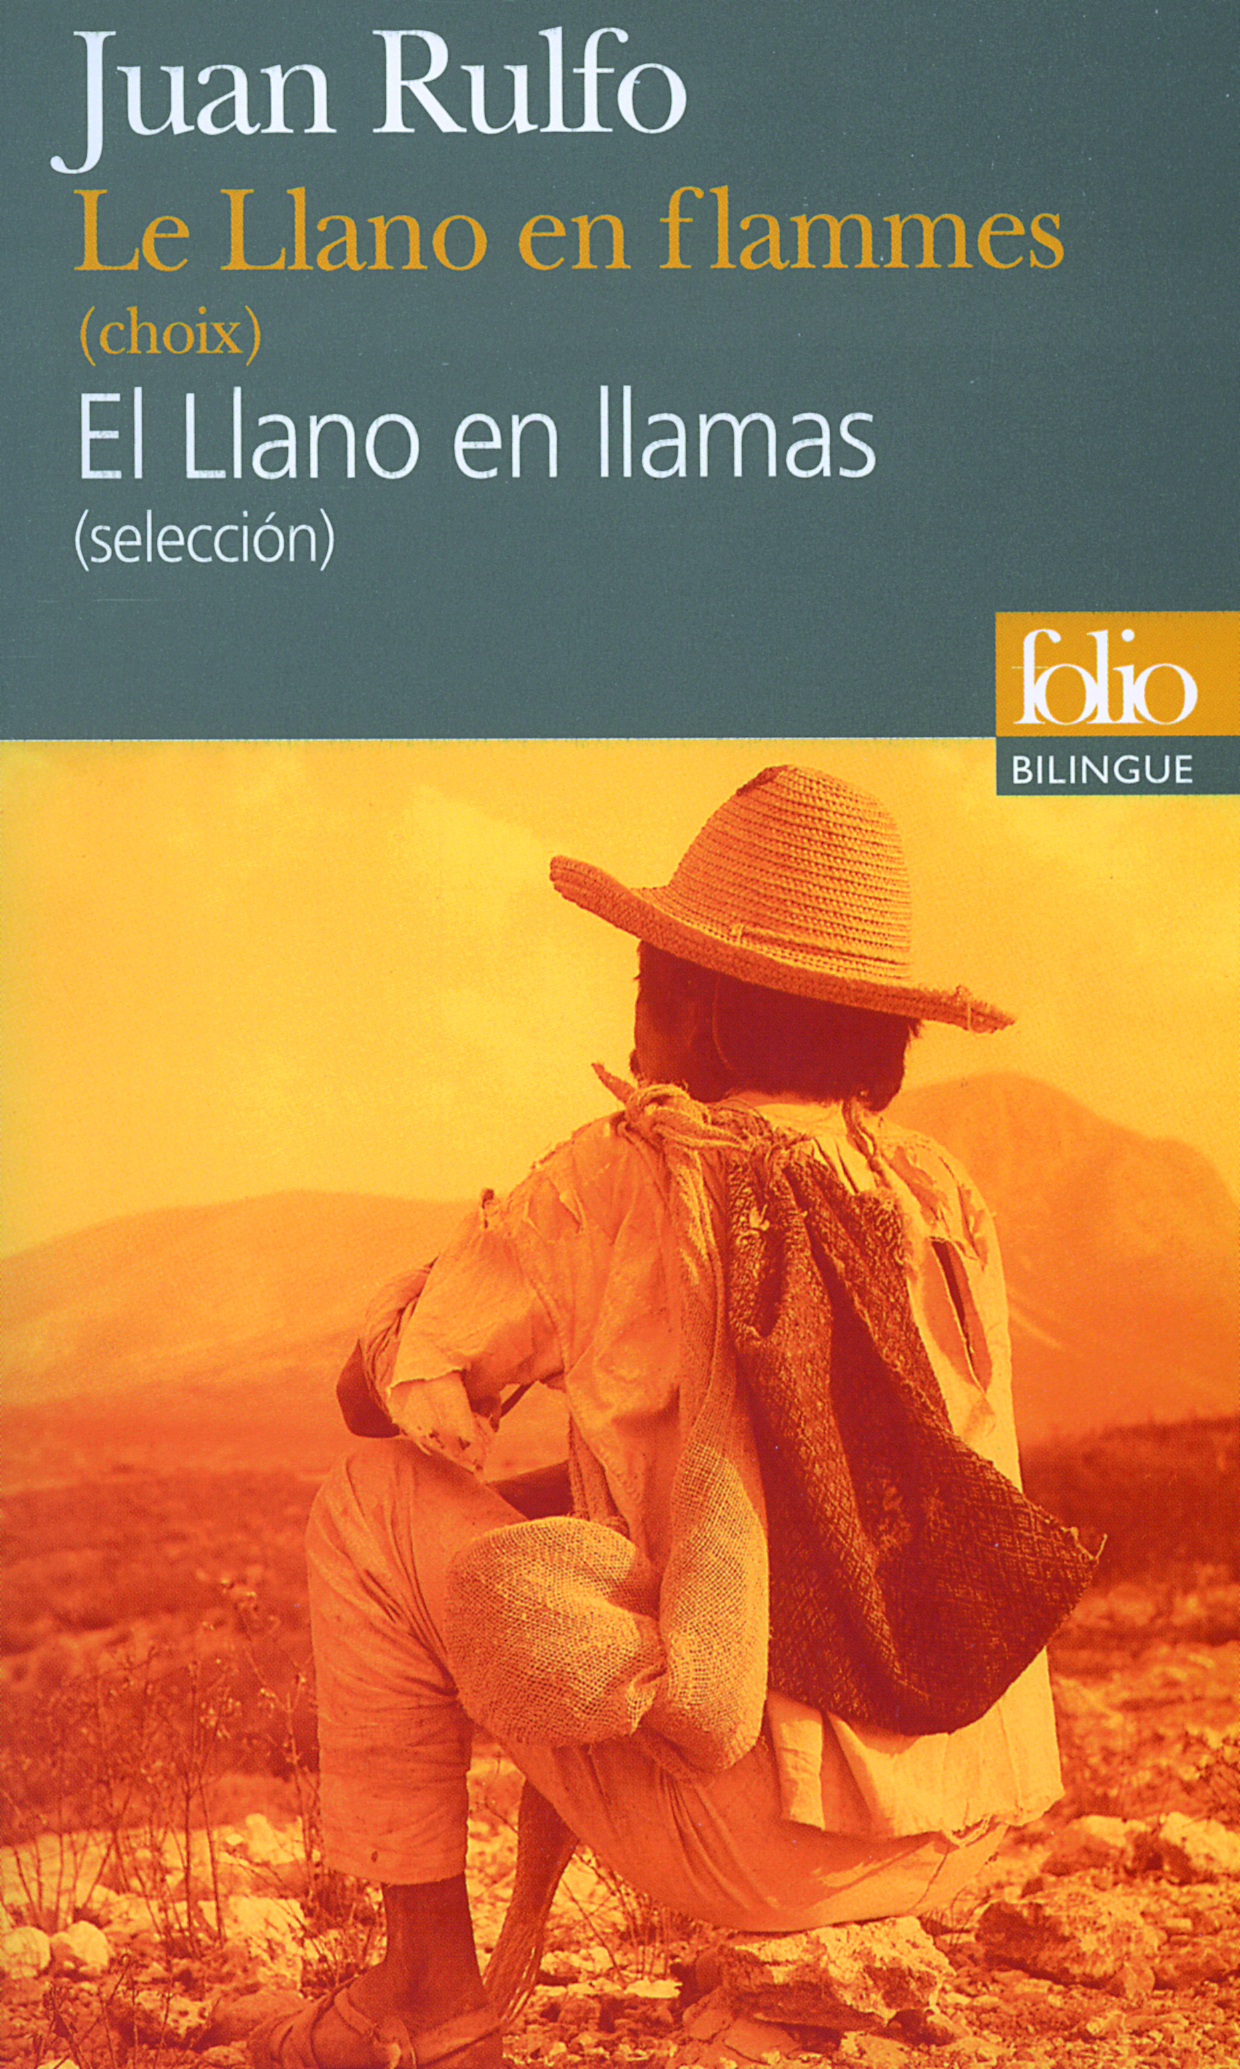 LE LLANO EN FLAMMES (CHOIX)/EL LLANO EN LLAMAS (SELECCION)